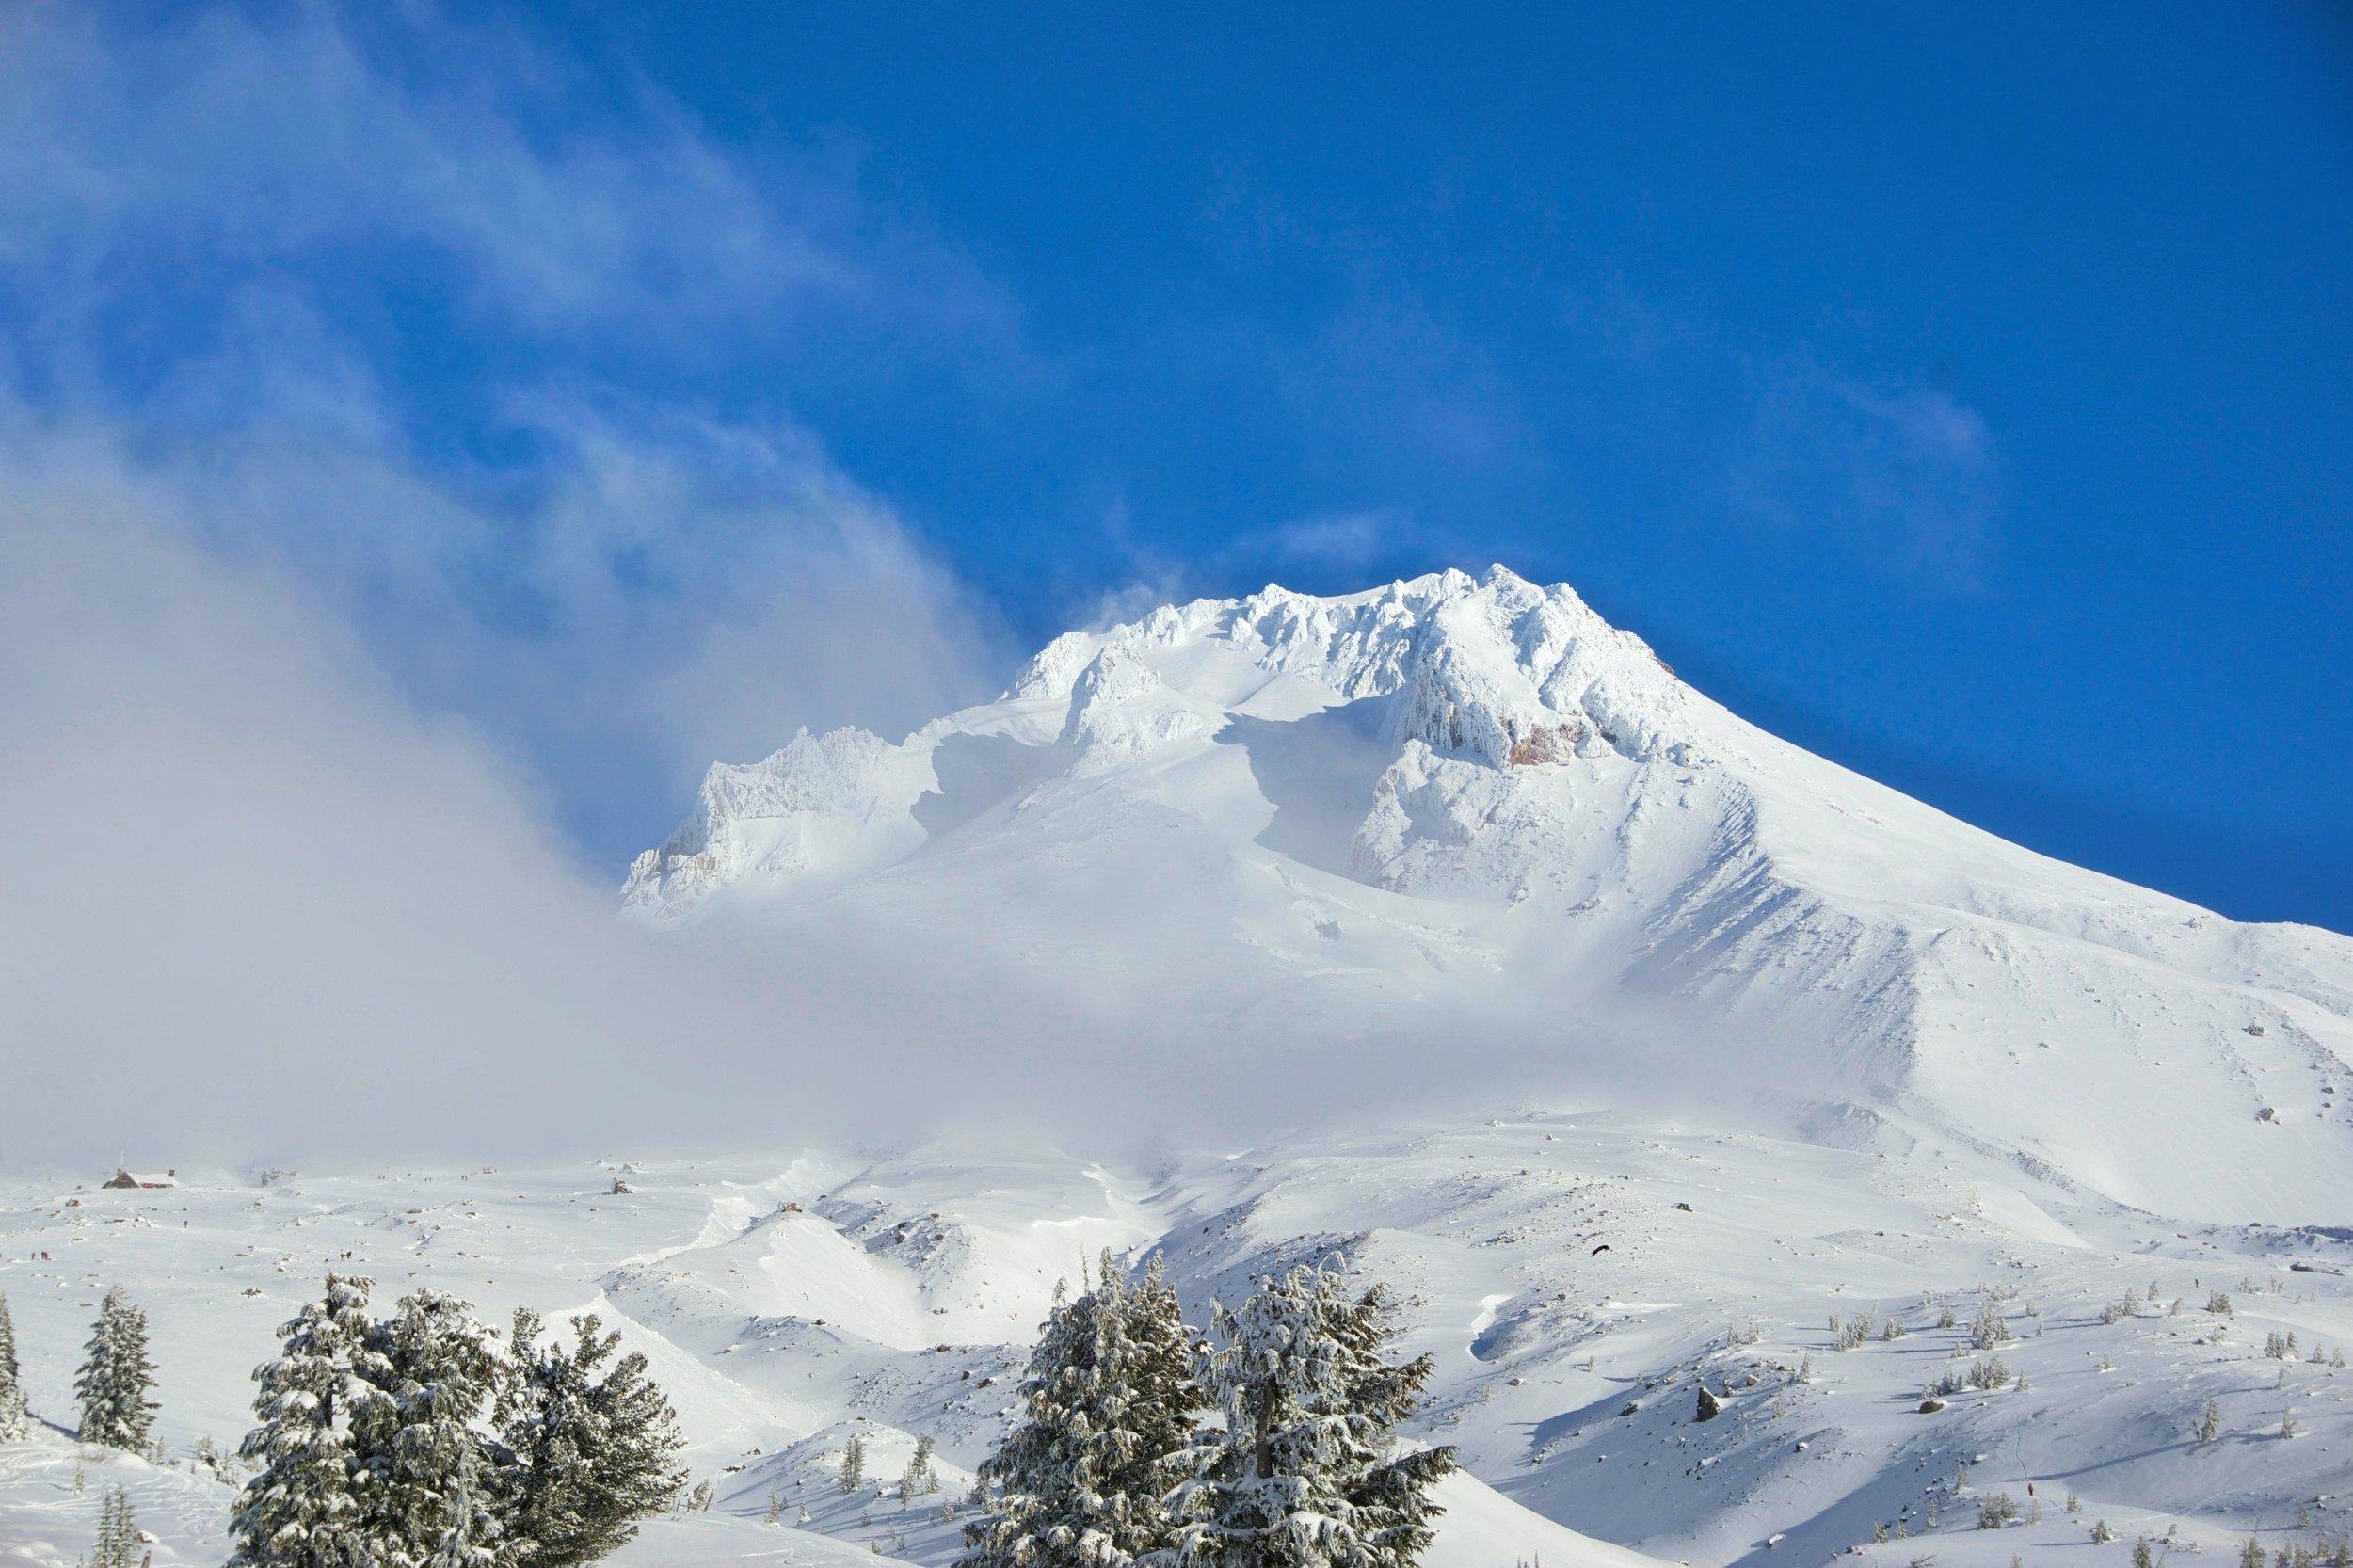 Snowshoeing on Mount Hood